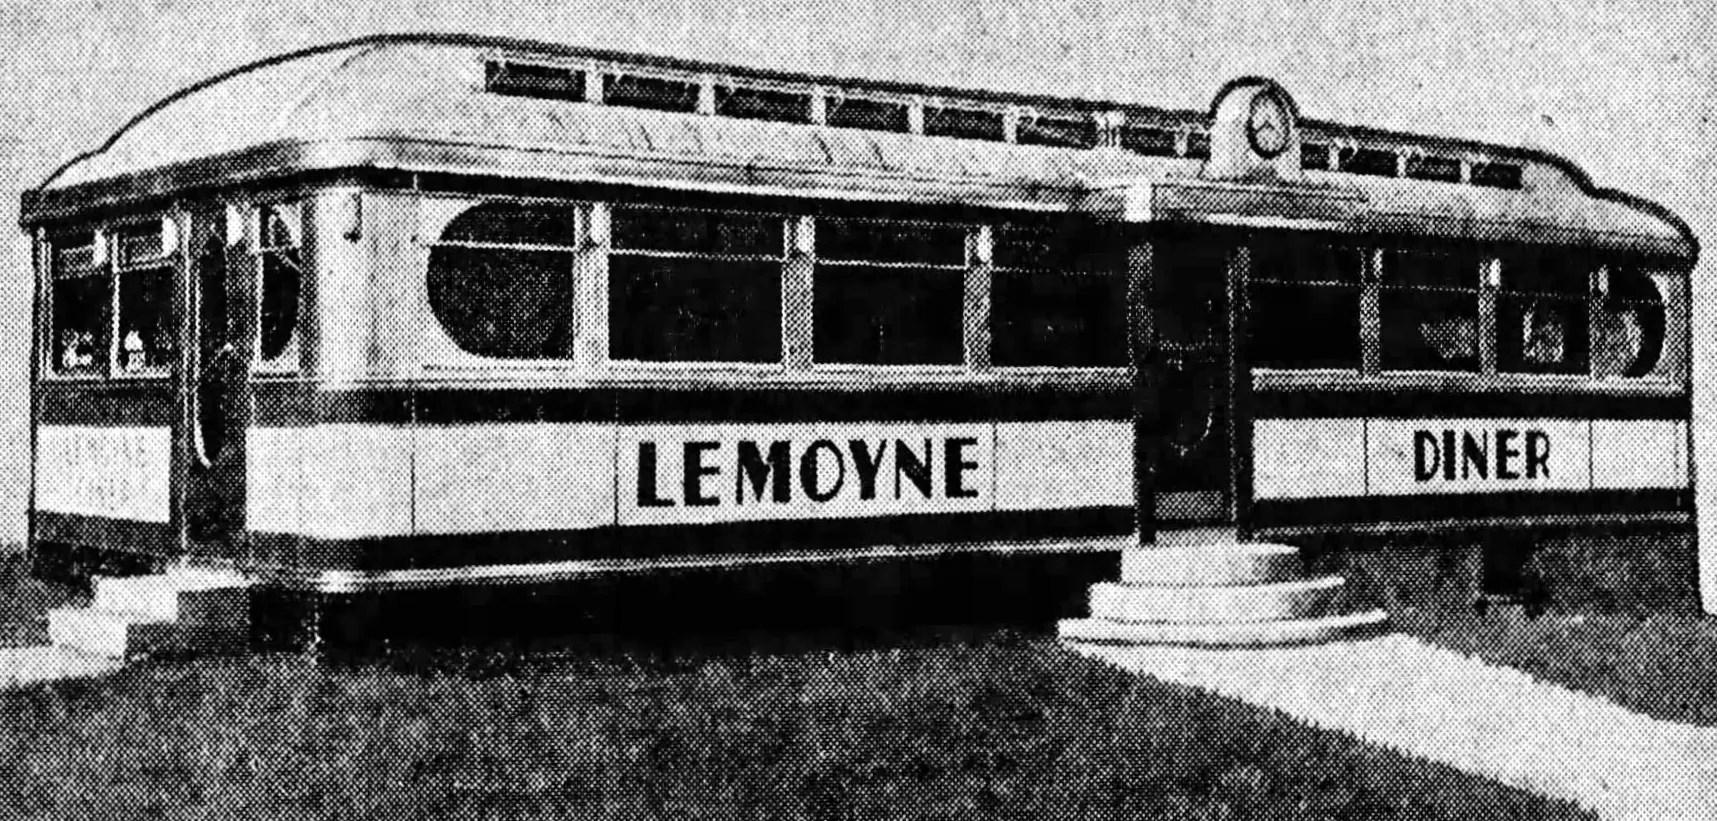 photo lemoyne-Copy-Copy.jpg